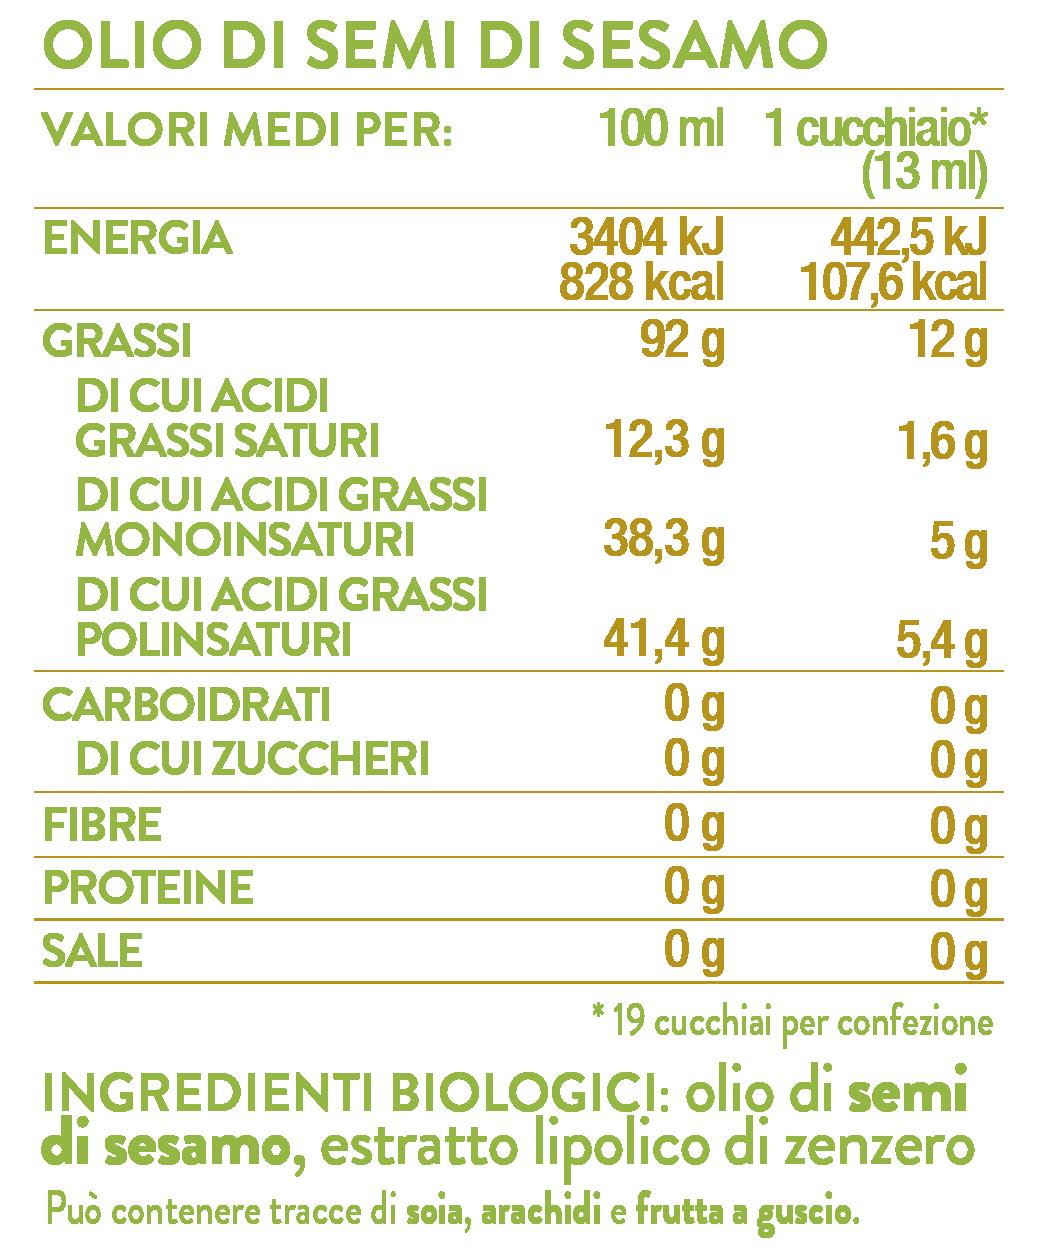 TABELLE NUTRIZIONALI WEB_SESAMO